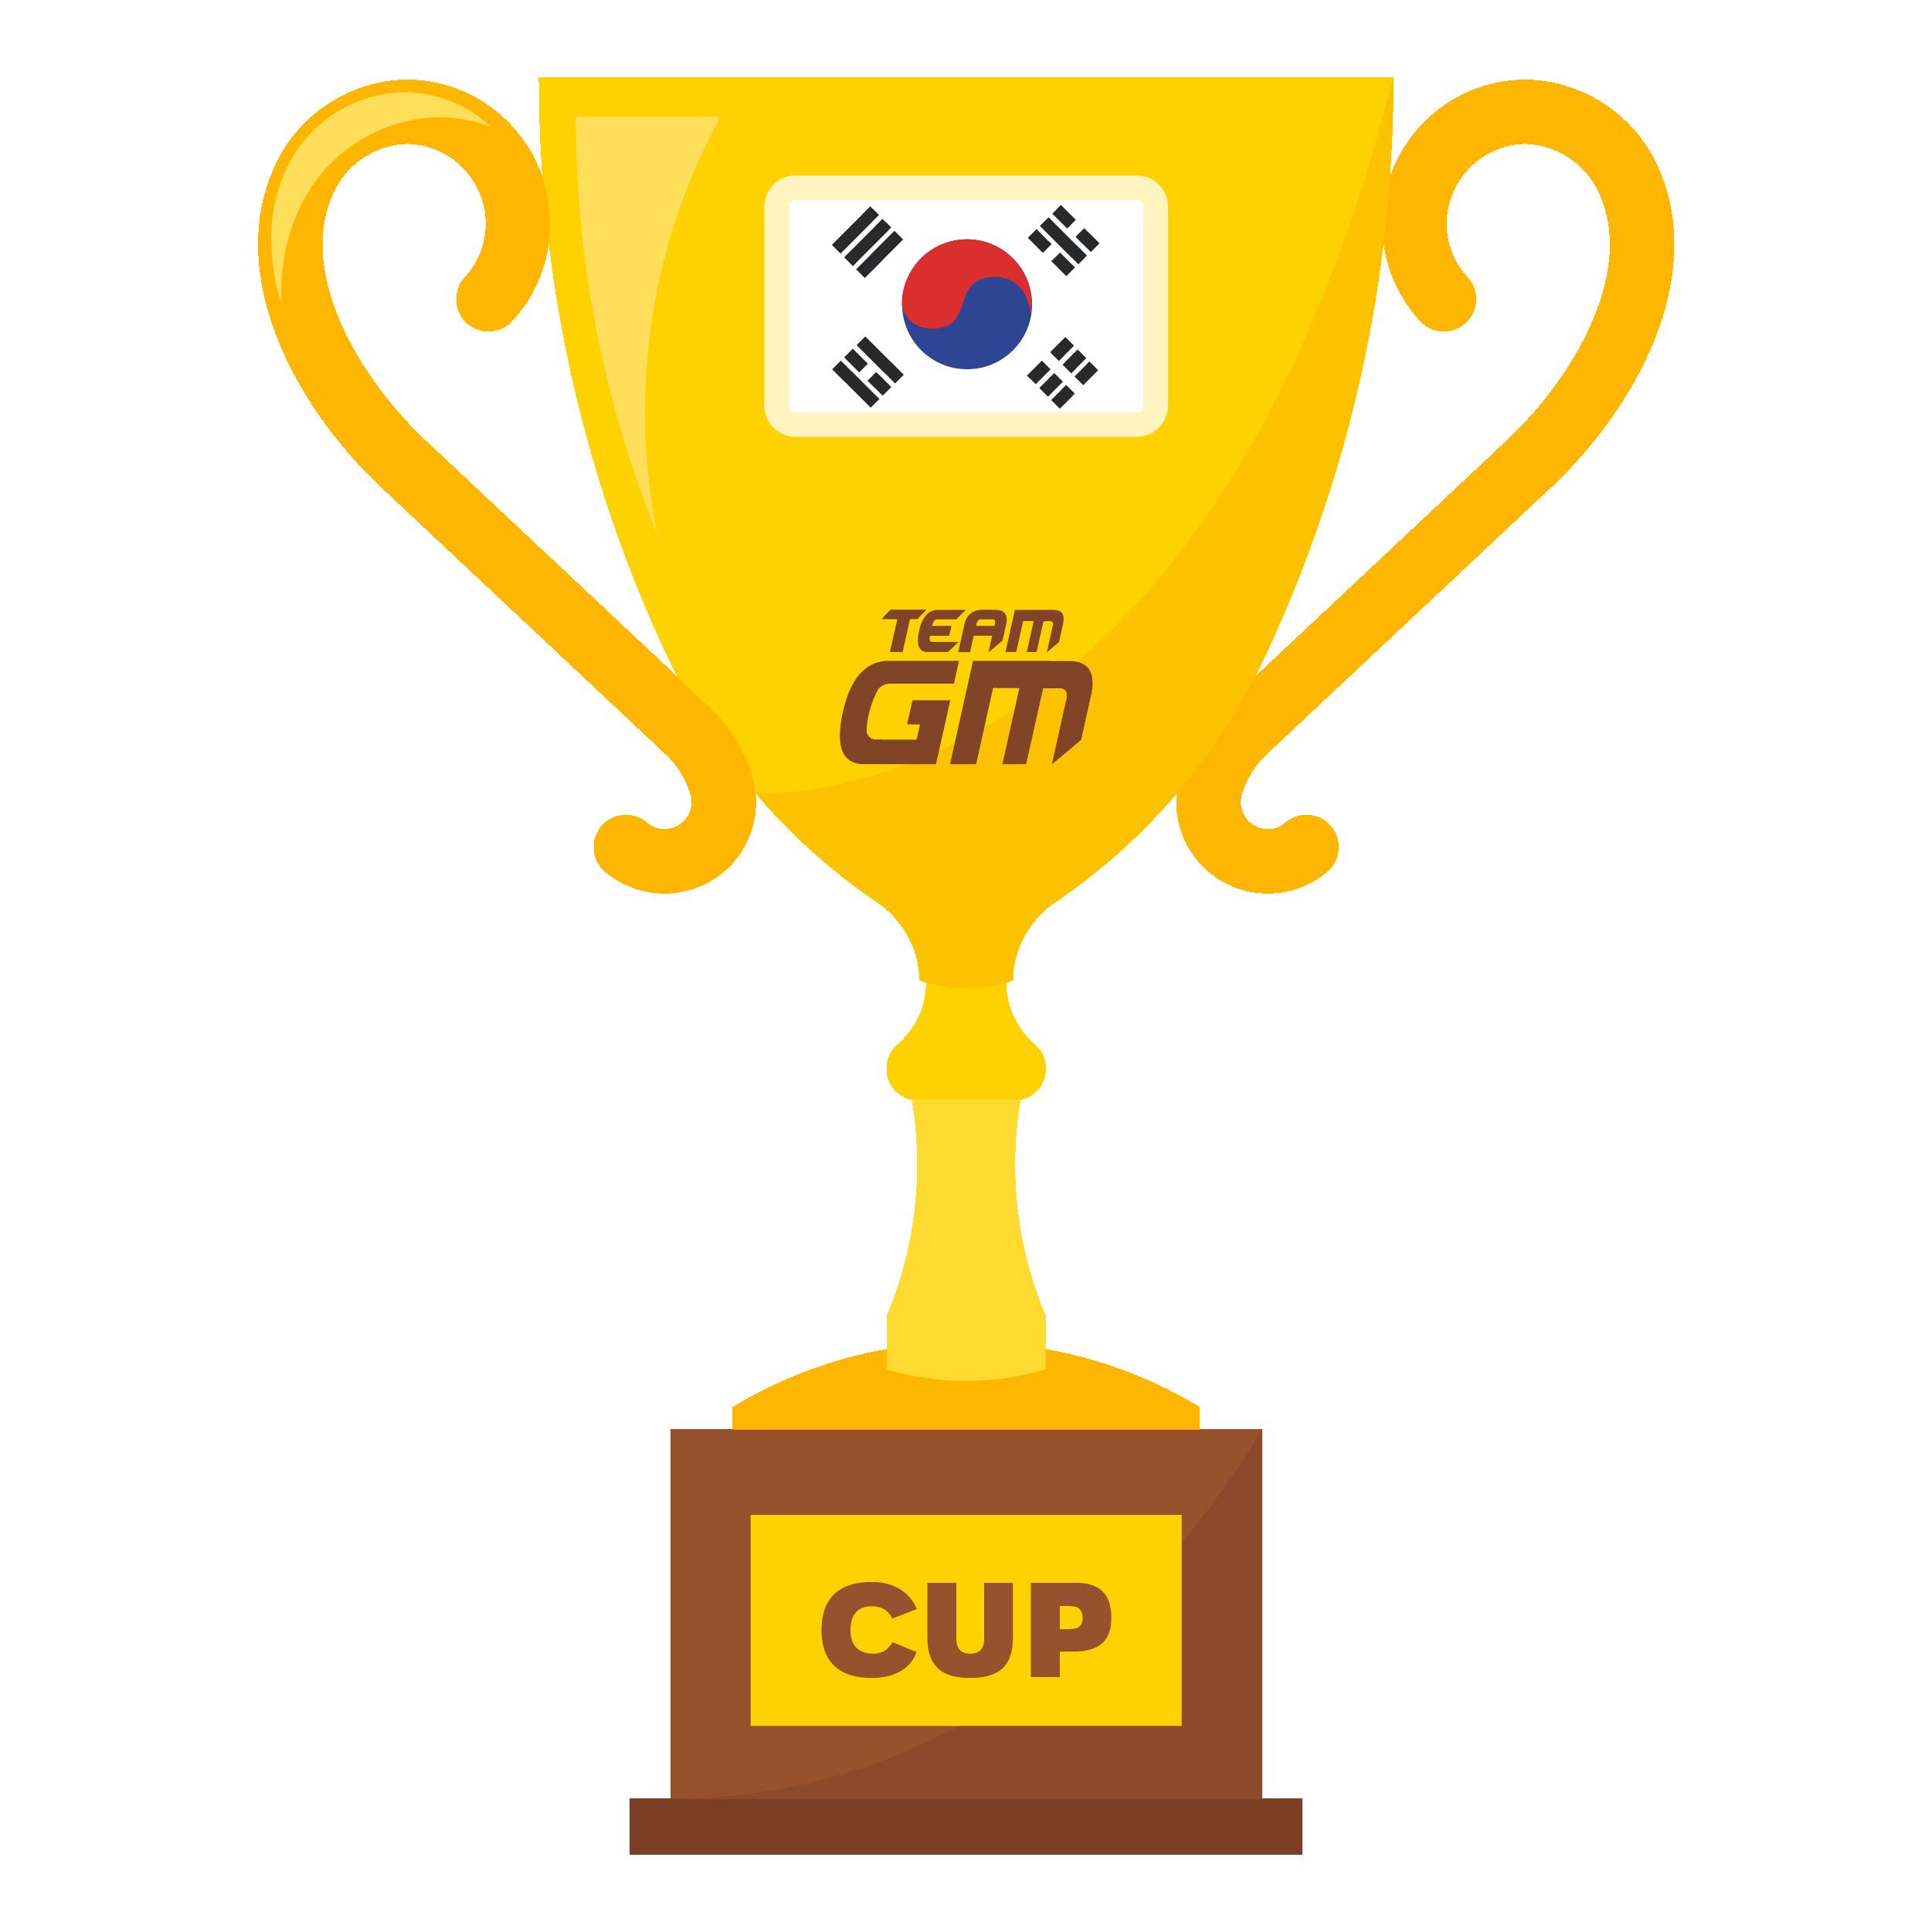 7TH - KOVO CUP